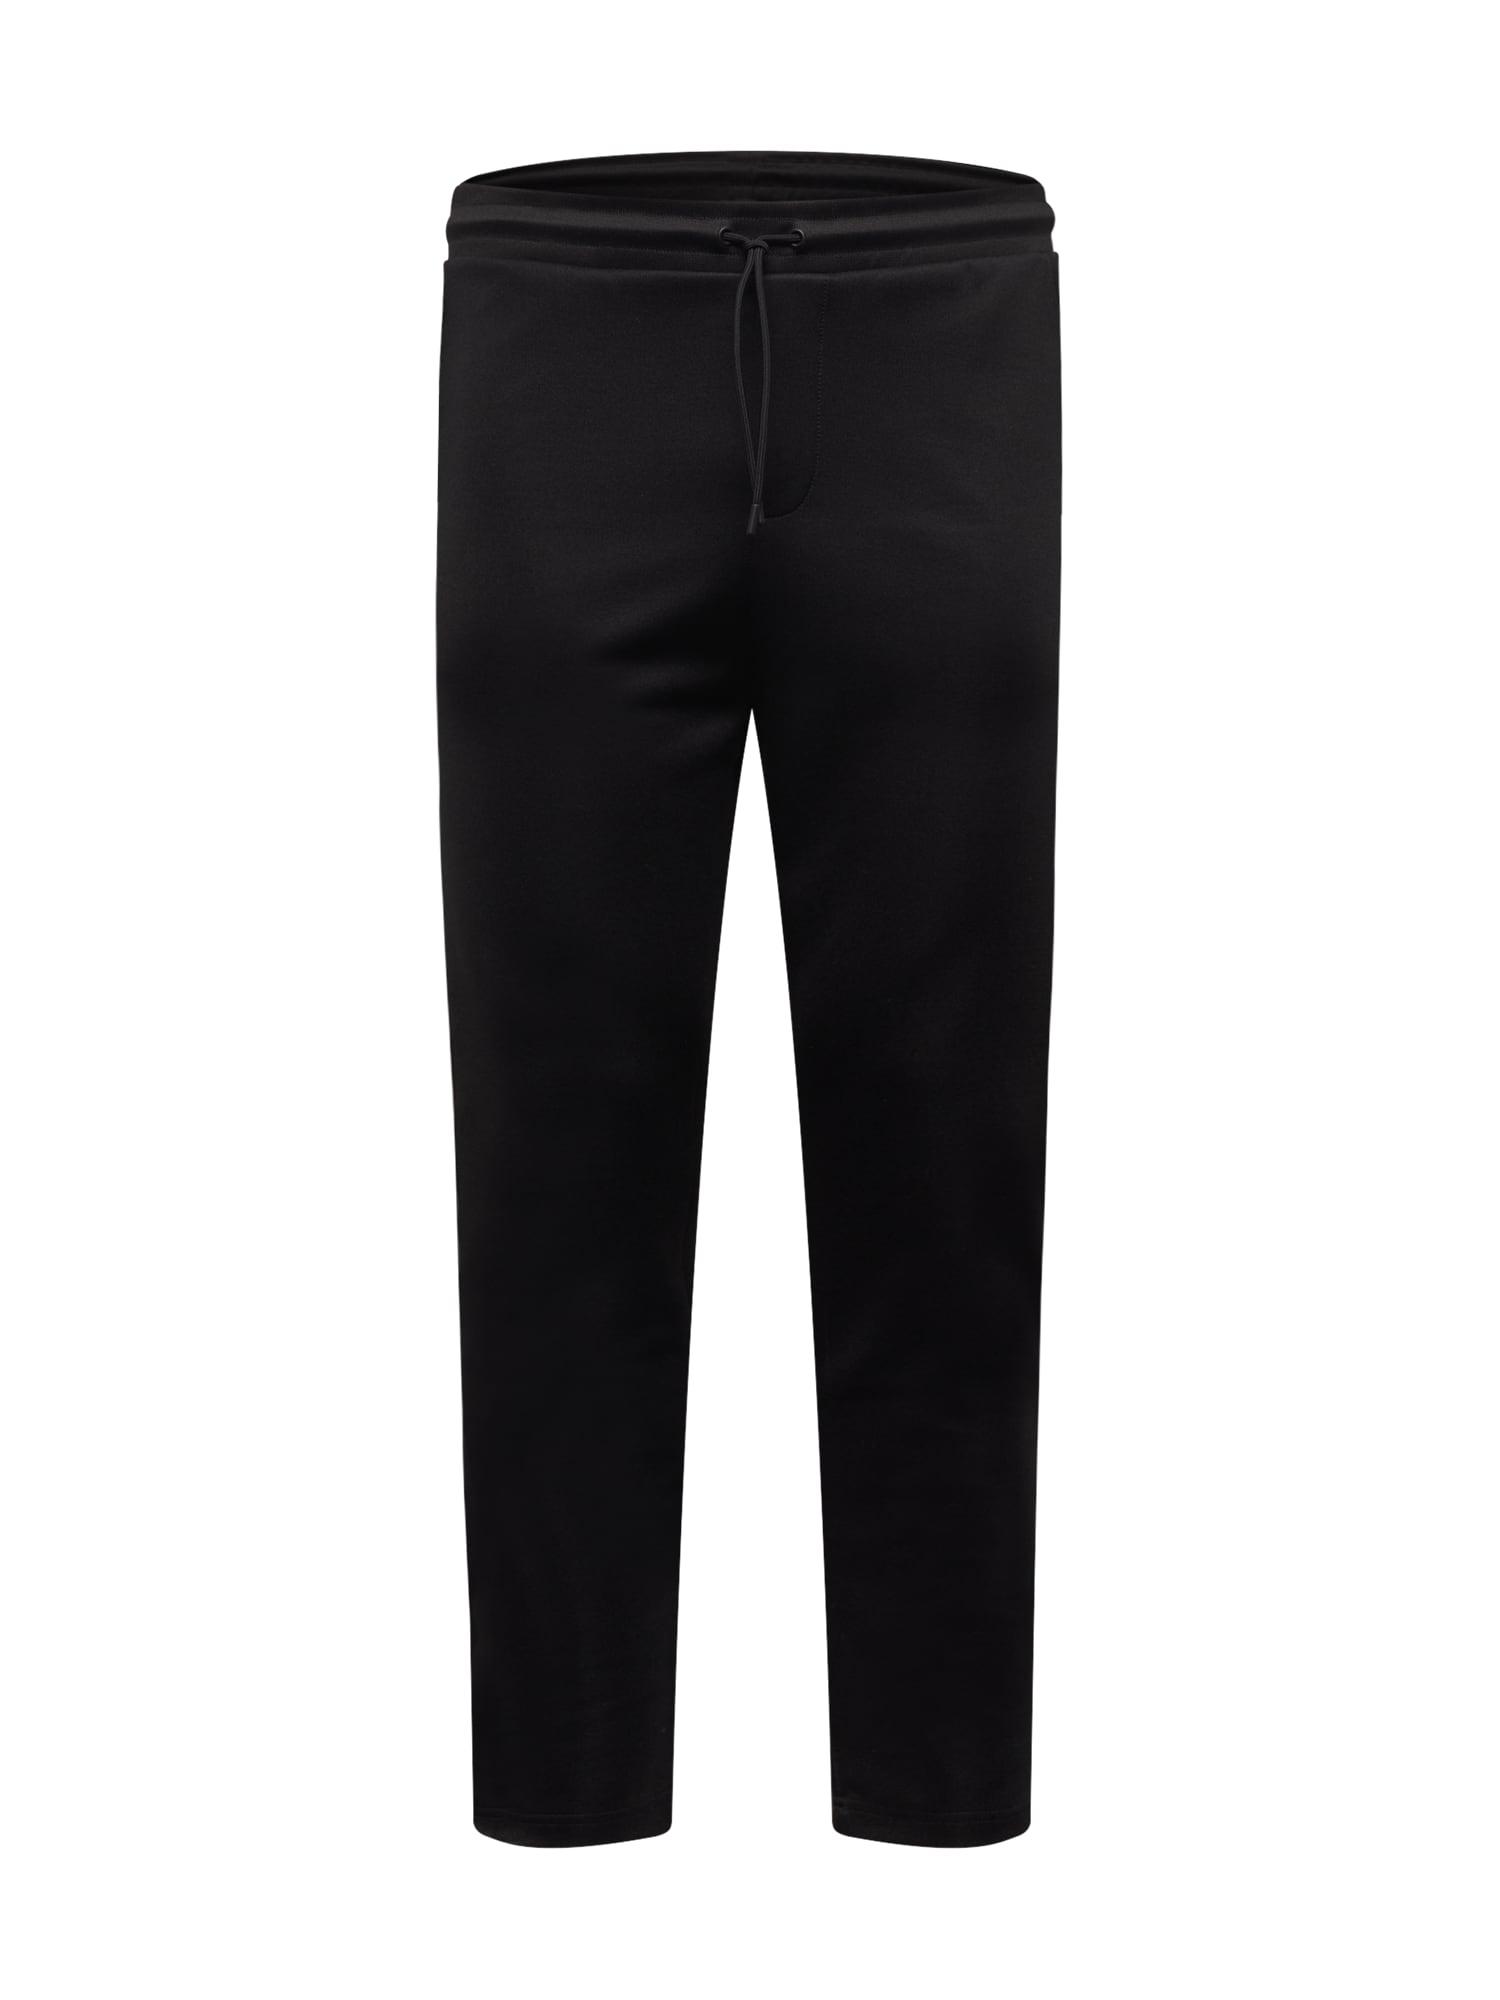 The Kooples Pantalon  - Noir - Taille: S - male